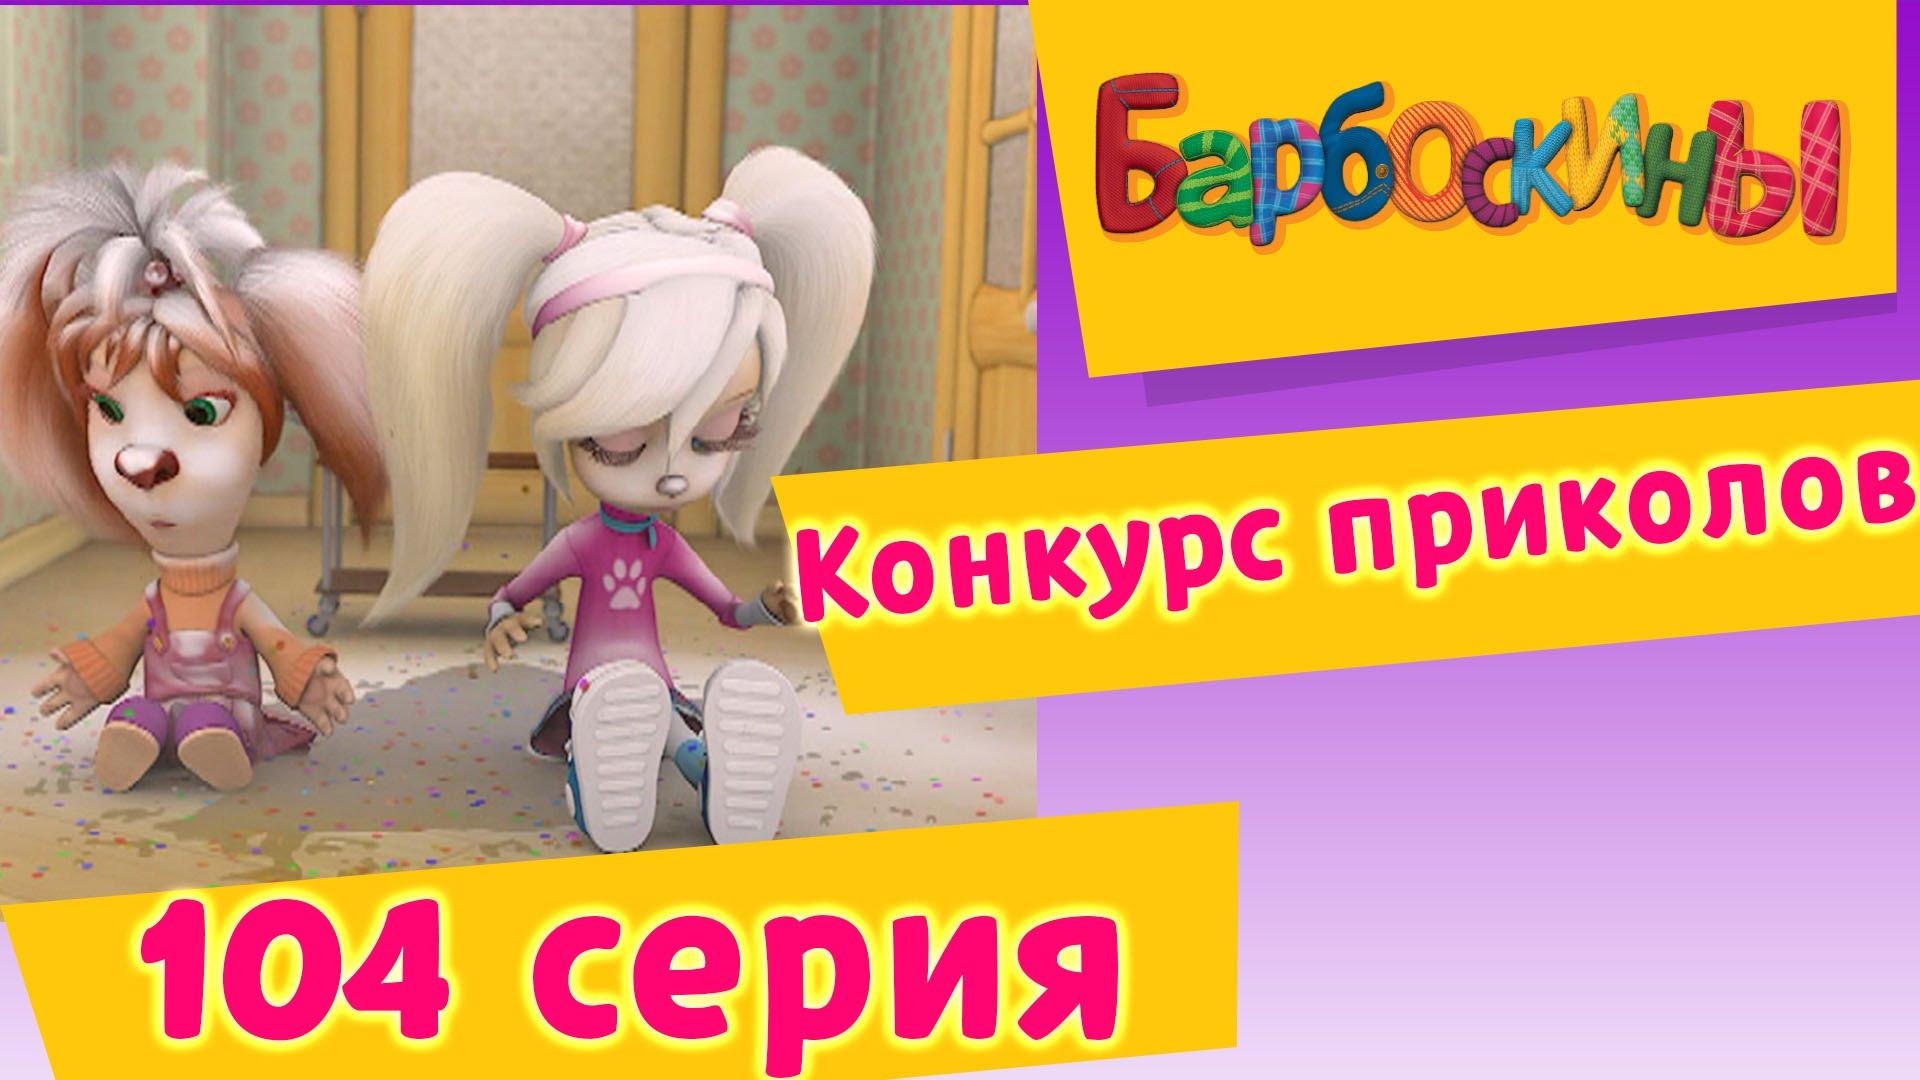 Барбоскины — 104 серия. Конкурс приколов